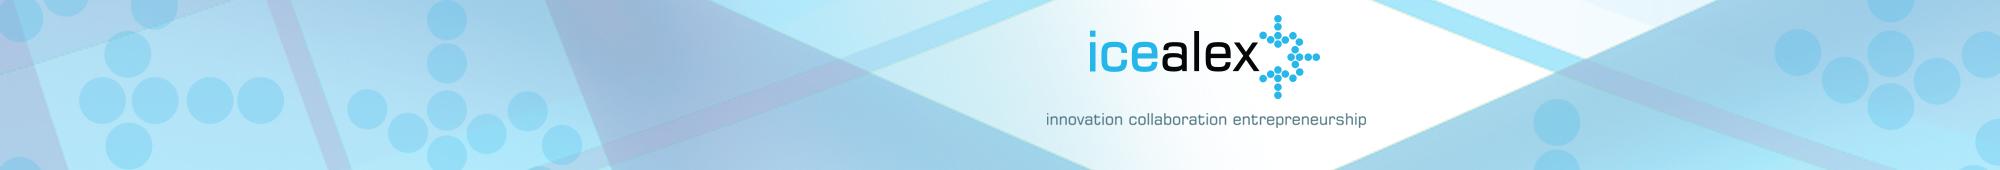 icealex: Innovation, Collaboration, Entrepreneurship